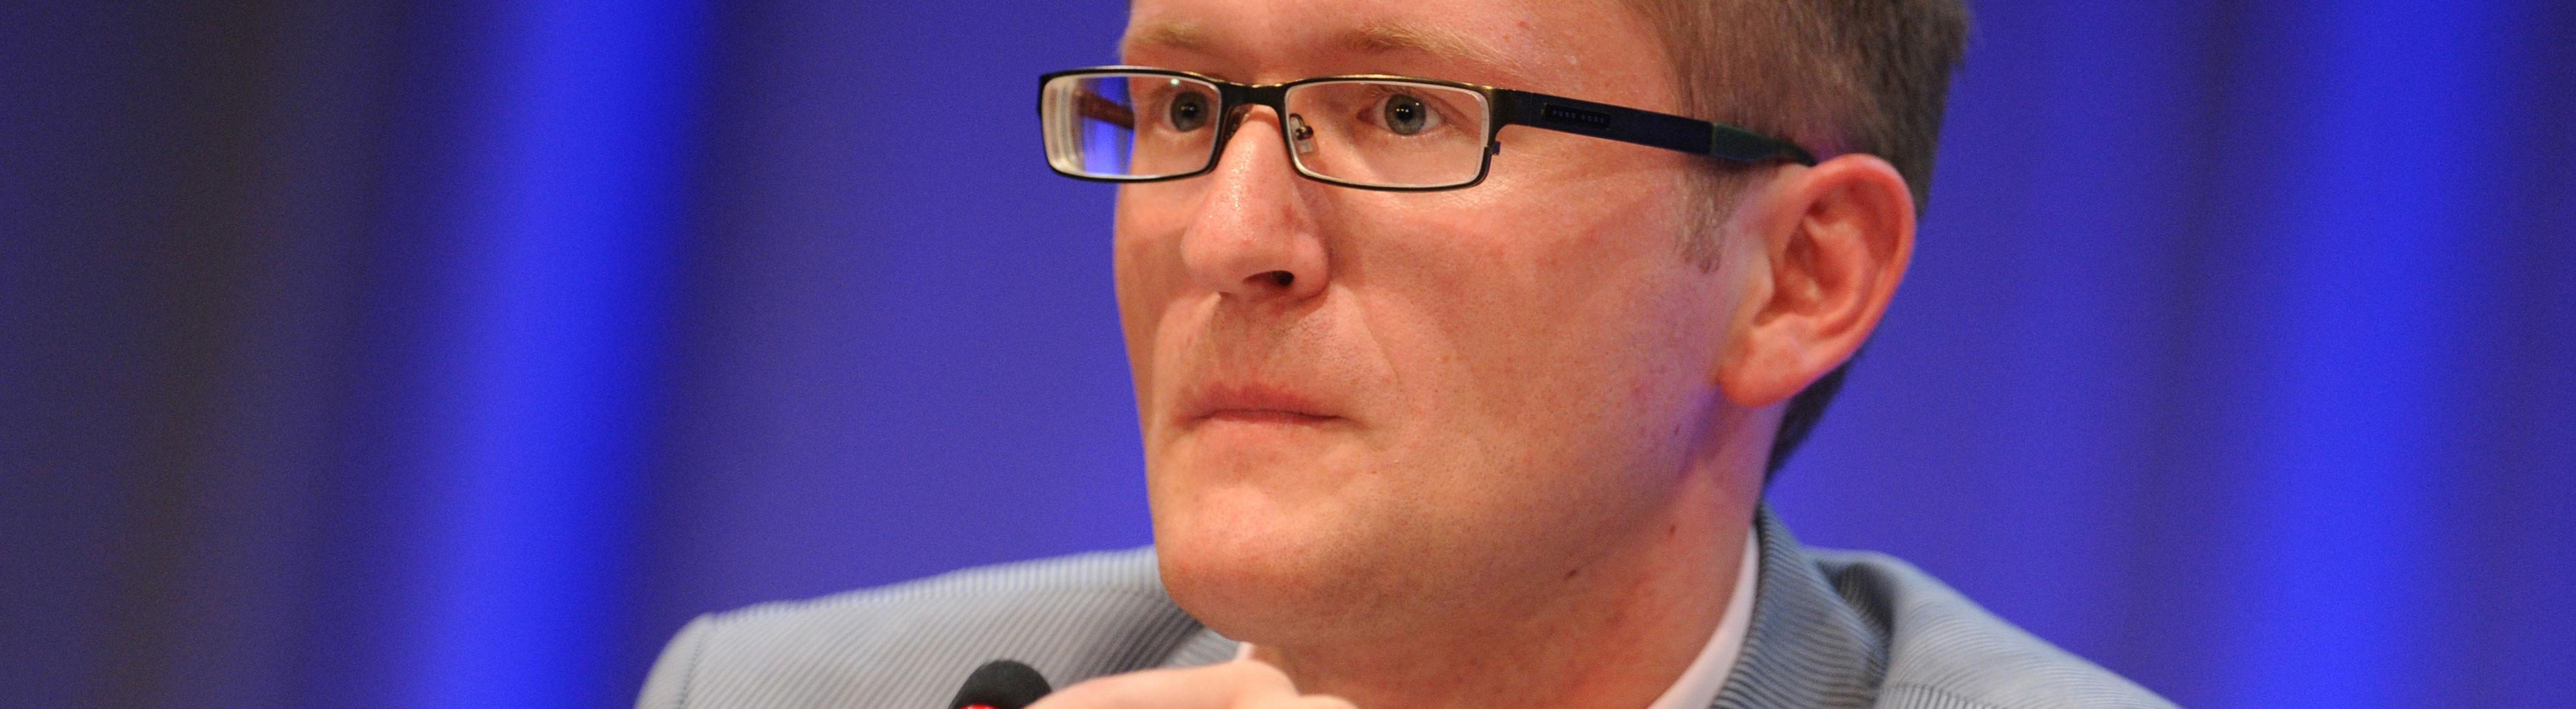 Der CSU-Politiker Wolfgang Stefinger; Foto: dpa